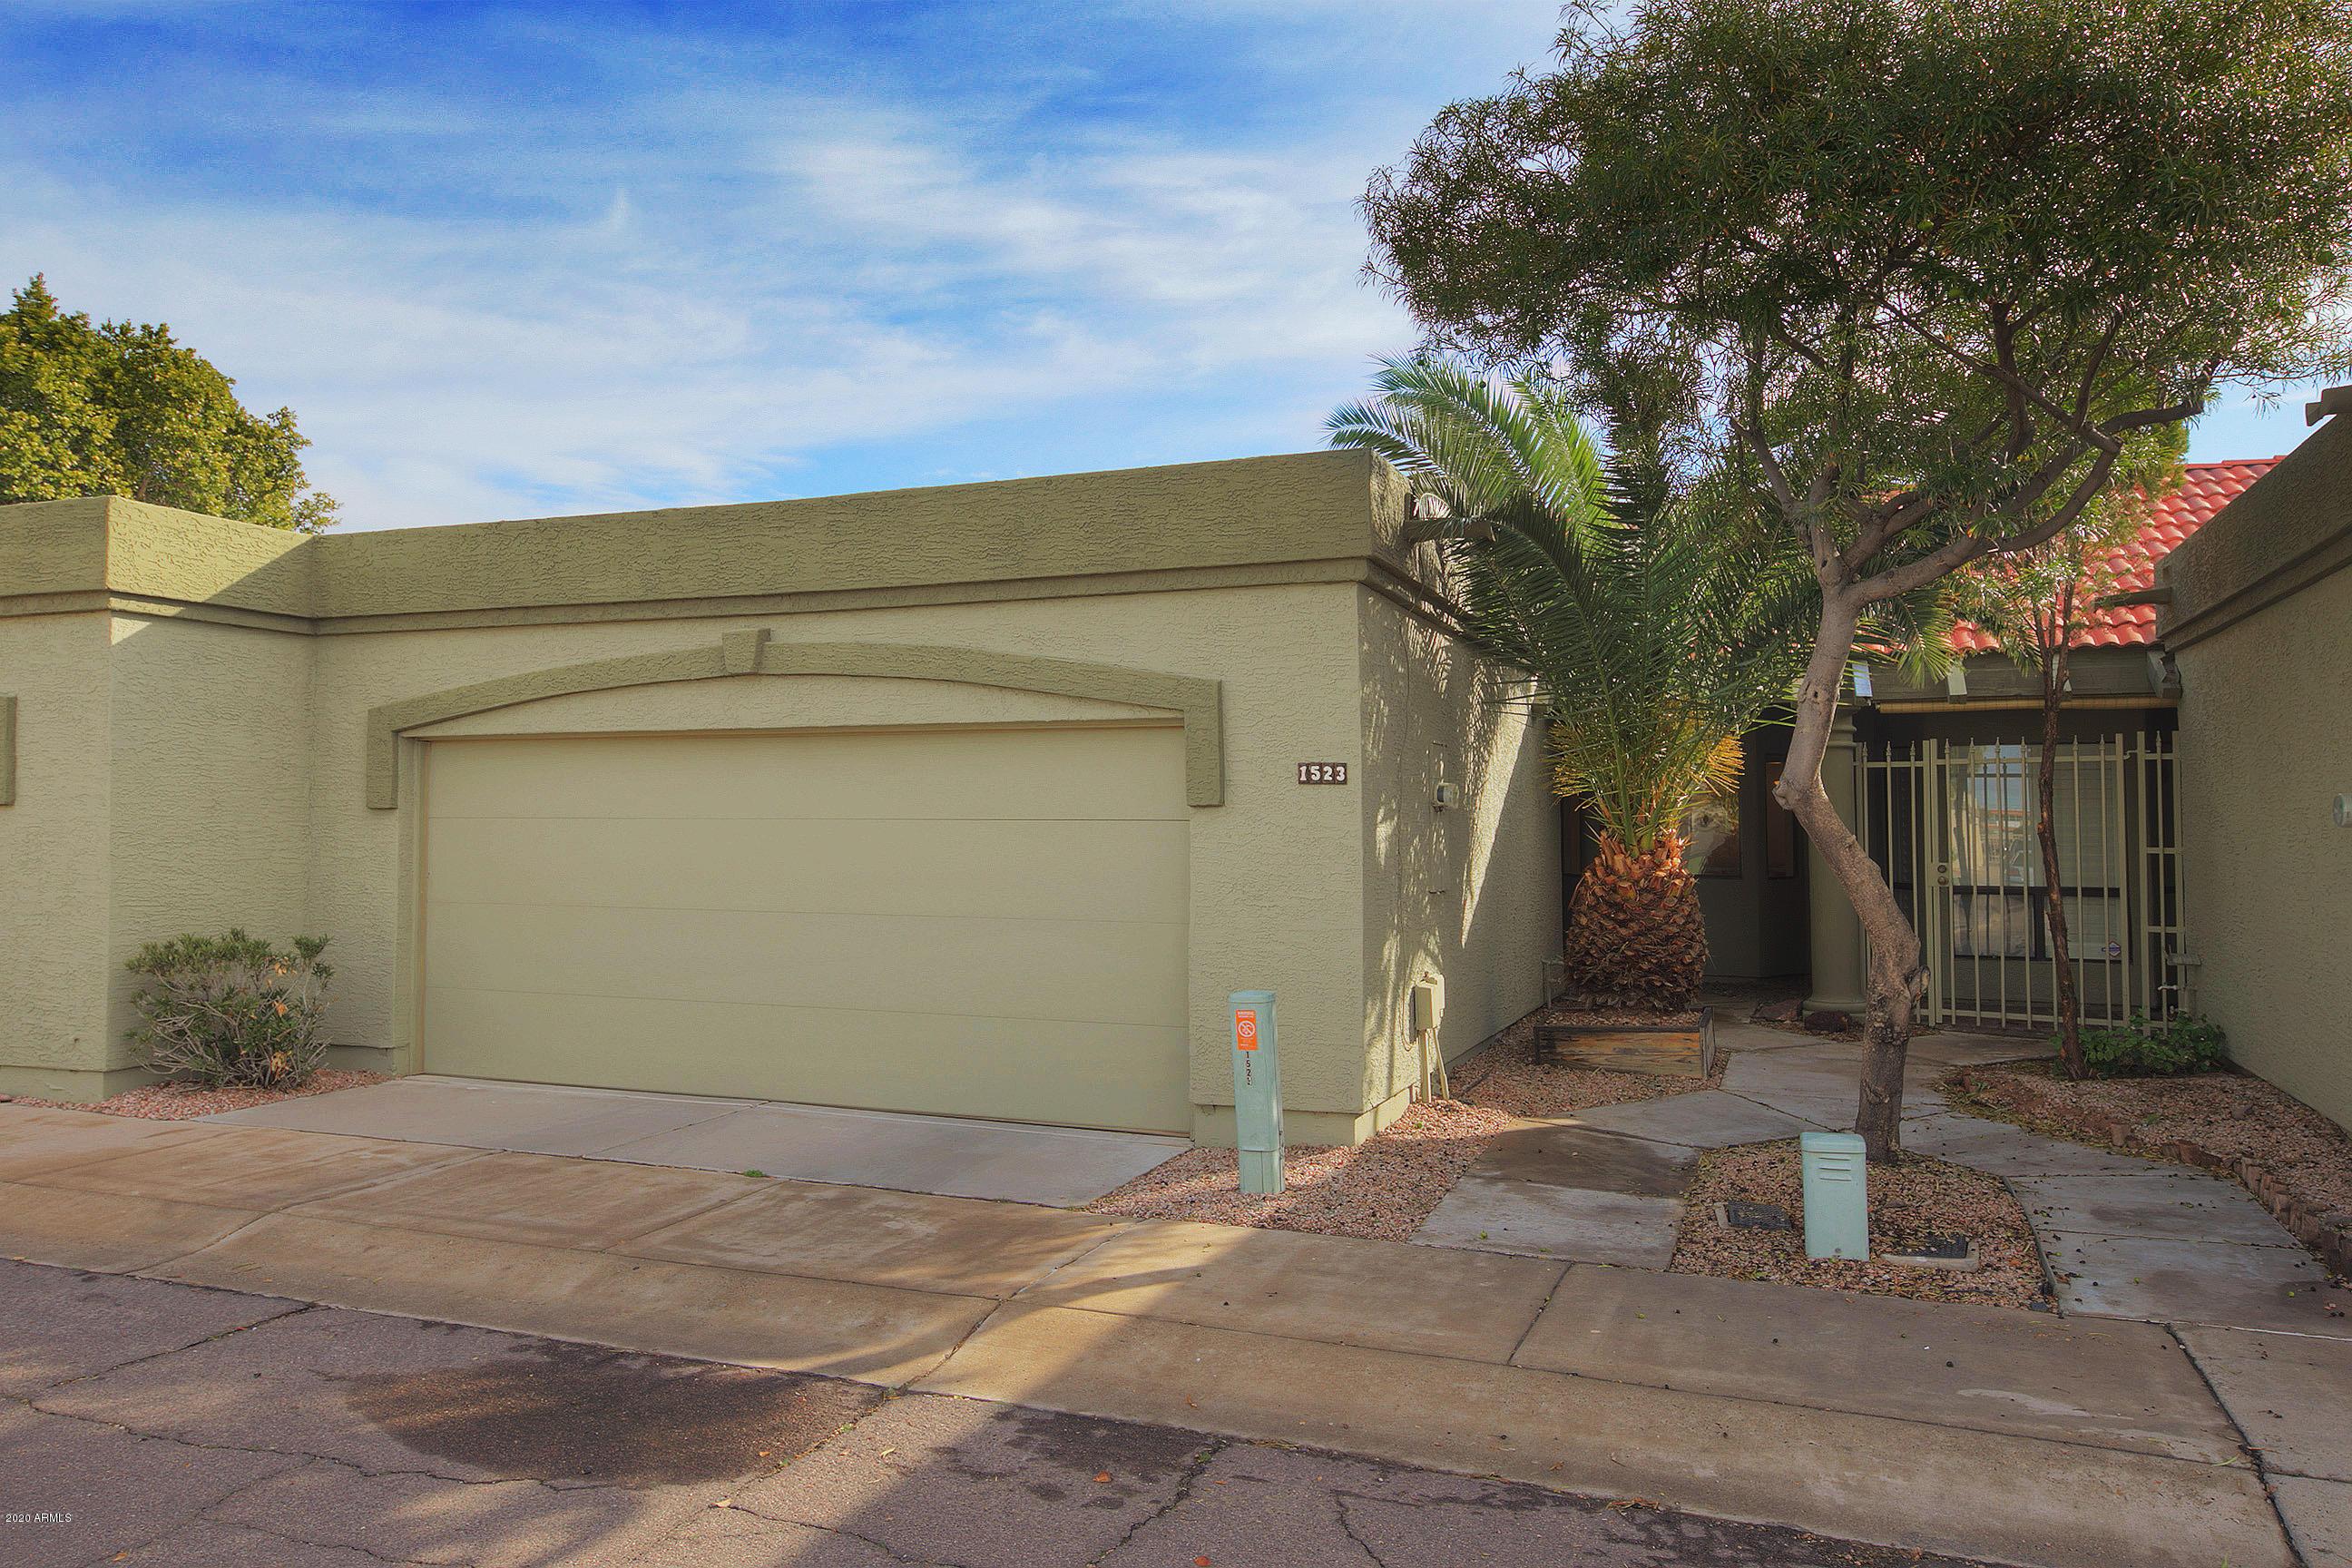 Photo of 1523 N OAK Street, Tempe, AZ 85281